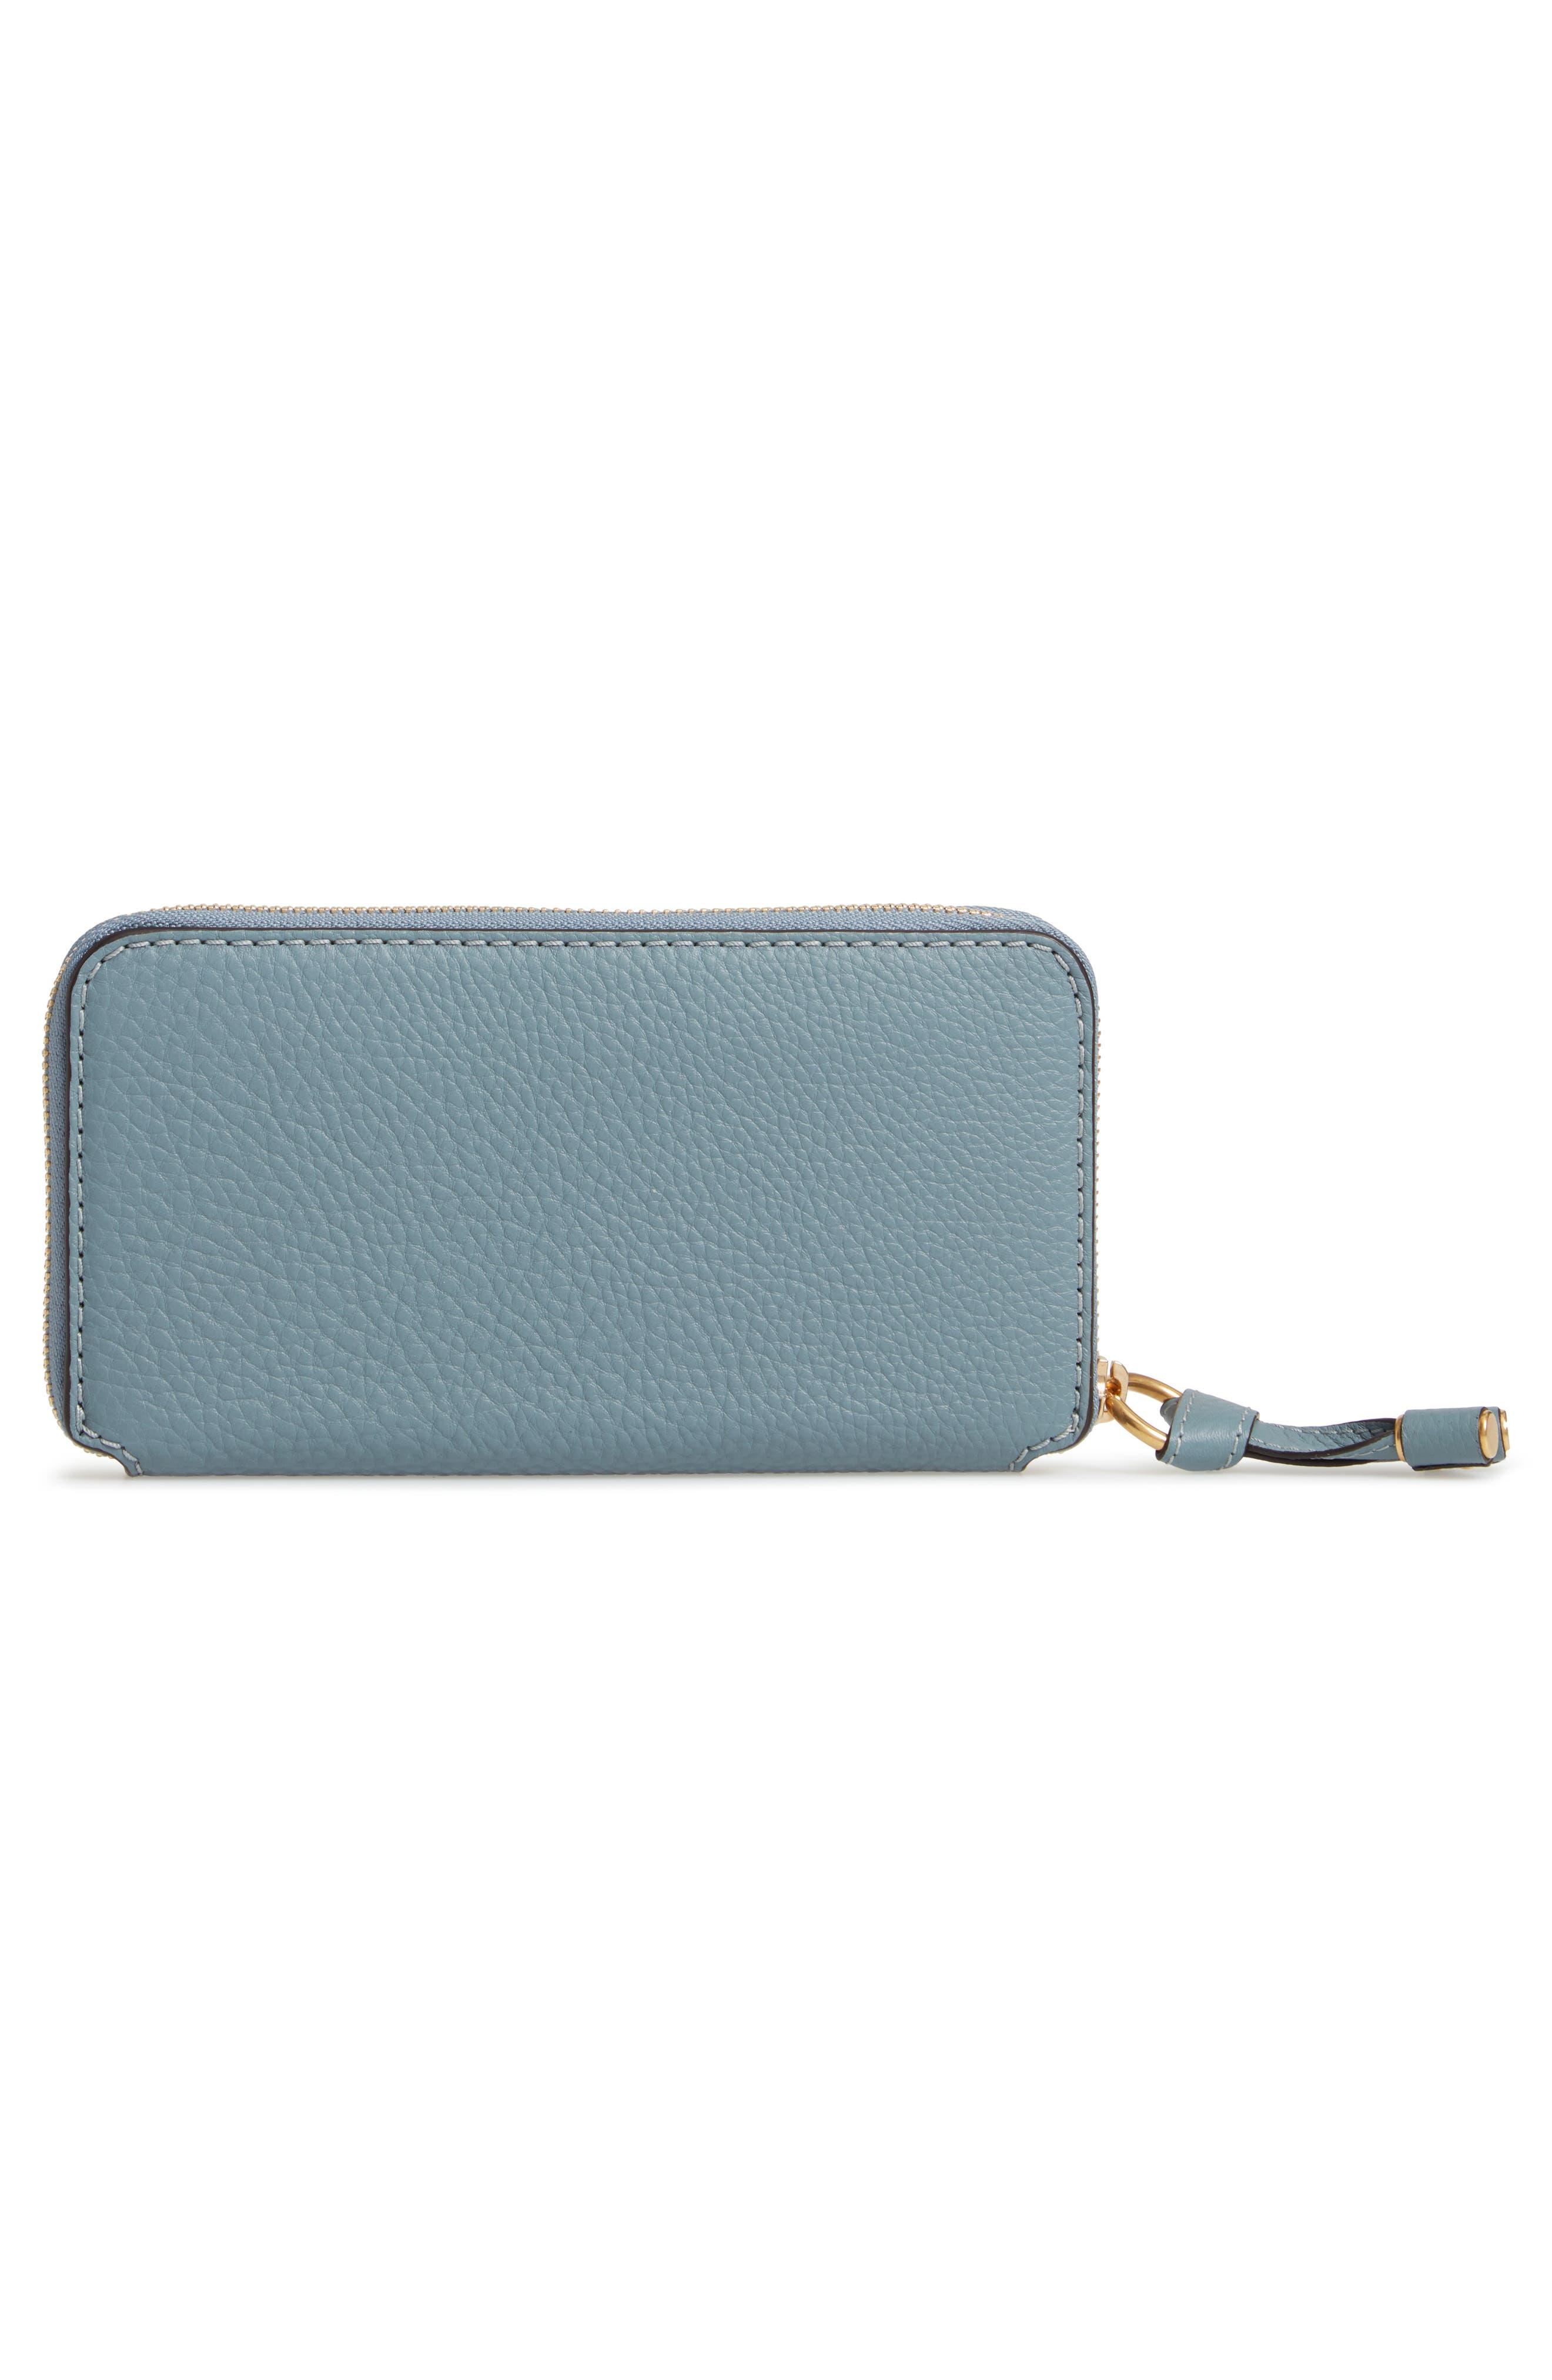 CHLOÉ, 'Marcie - Long' Zip Around Wallet, Alternate thumbnail 3, color, CLOUDY BLUE